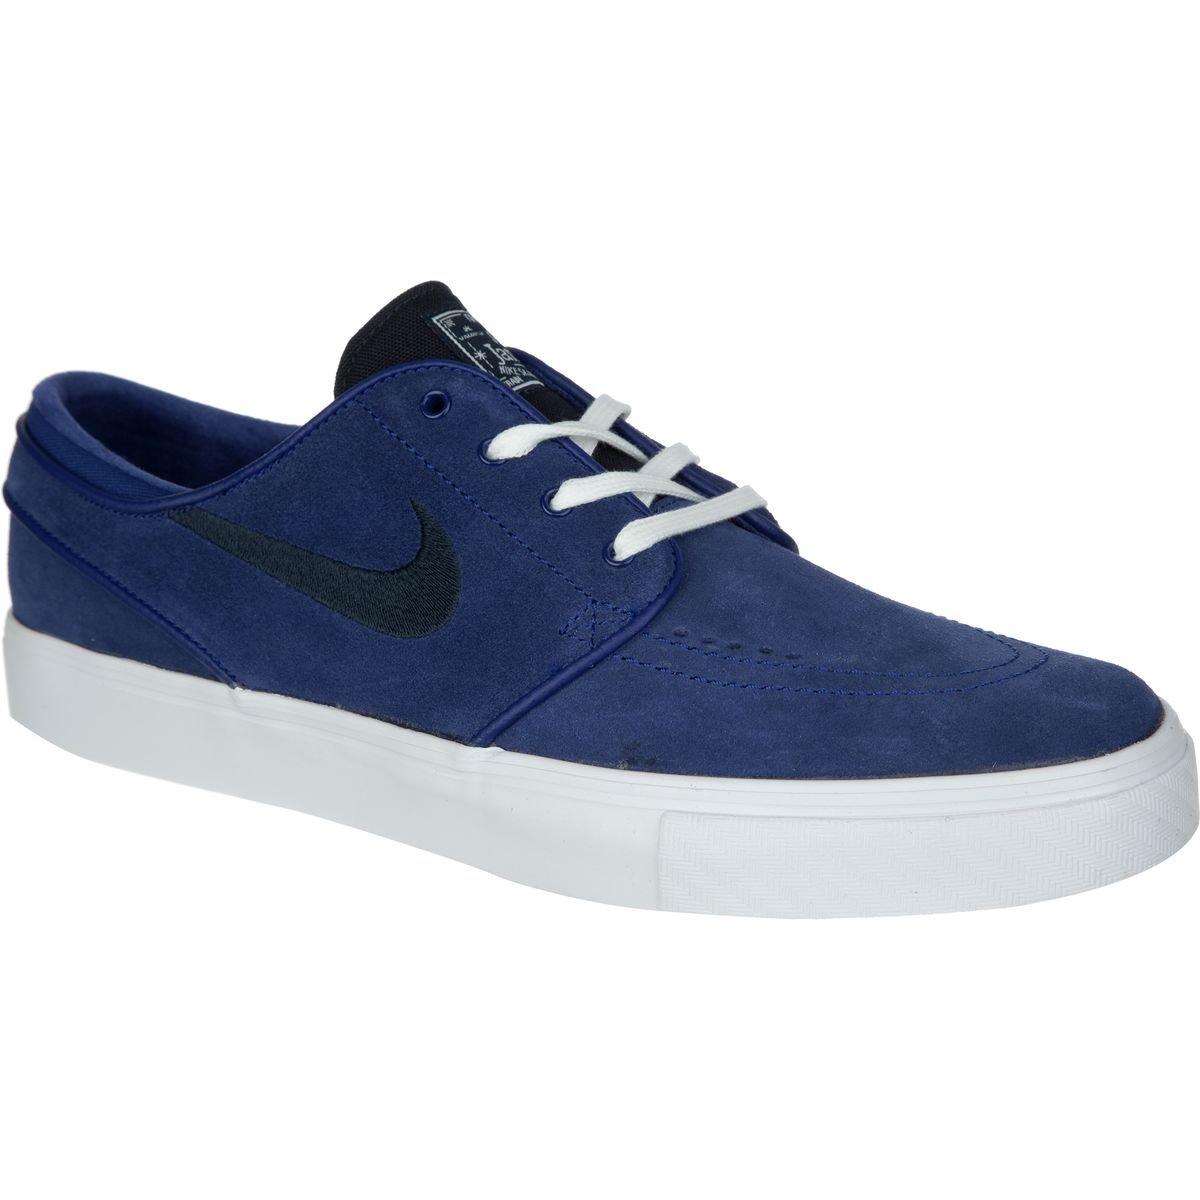 Nike Air Zoom Stefan Janoski L Schuhe Herren Sneaker Sportschuhe Schwarz 616490 016  28.5 EU|blue - blue